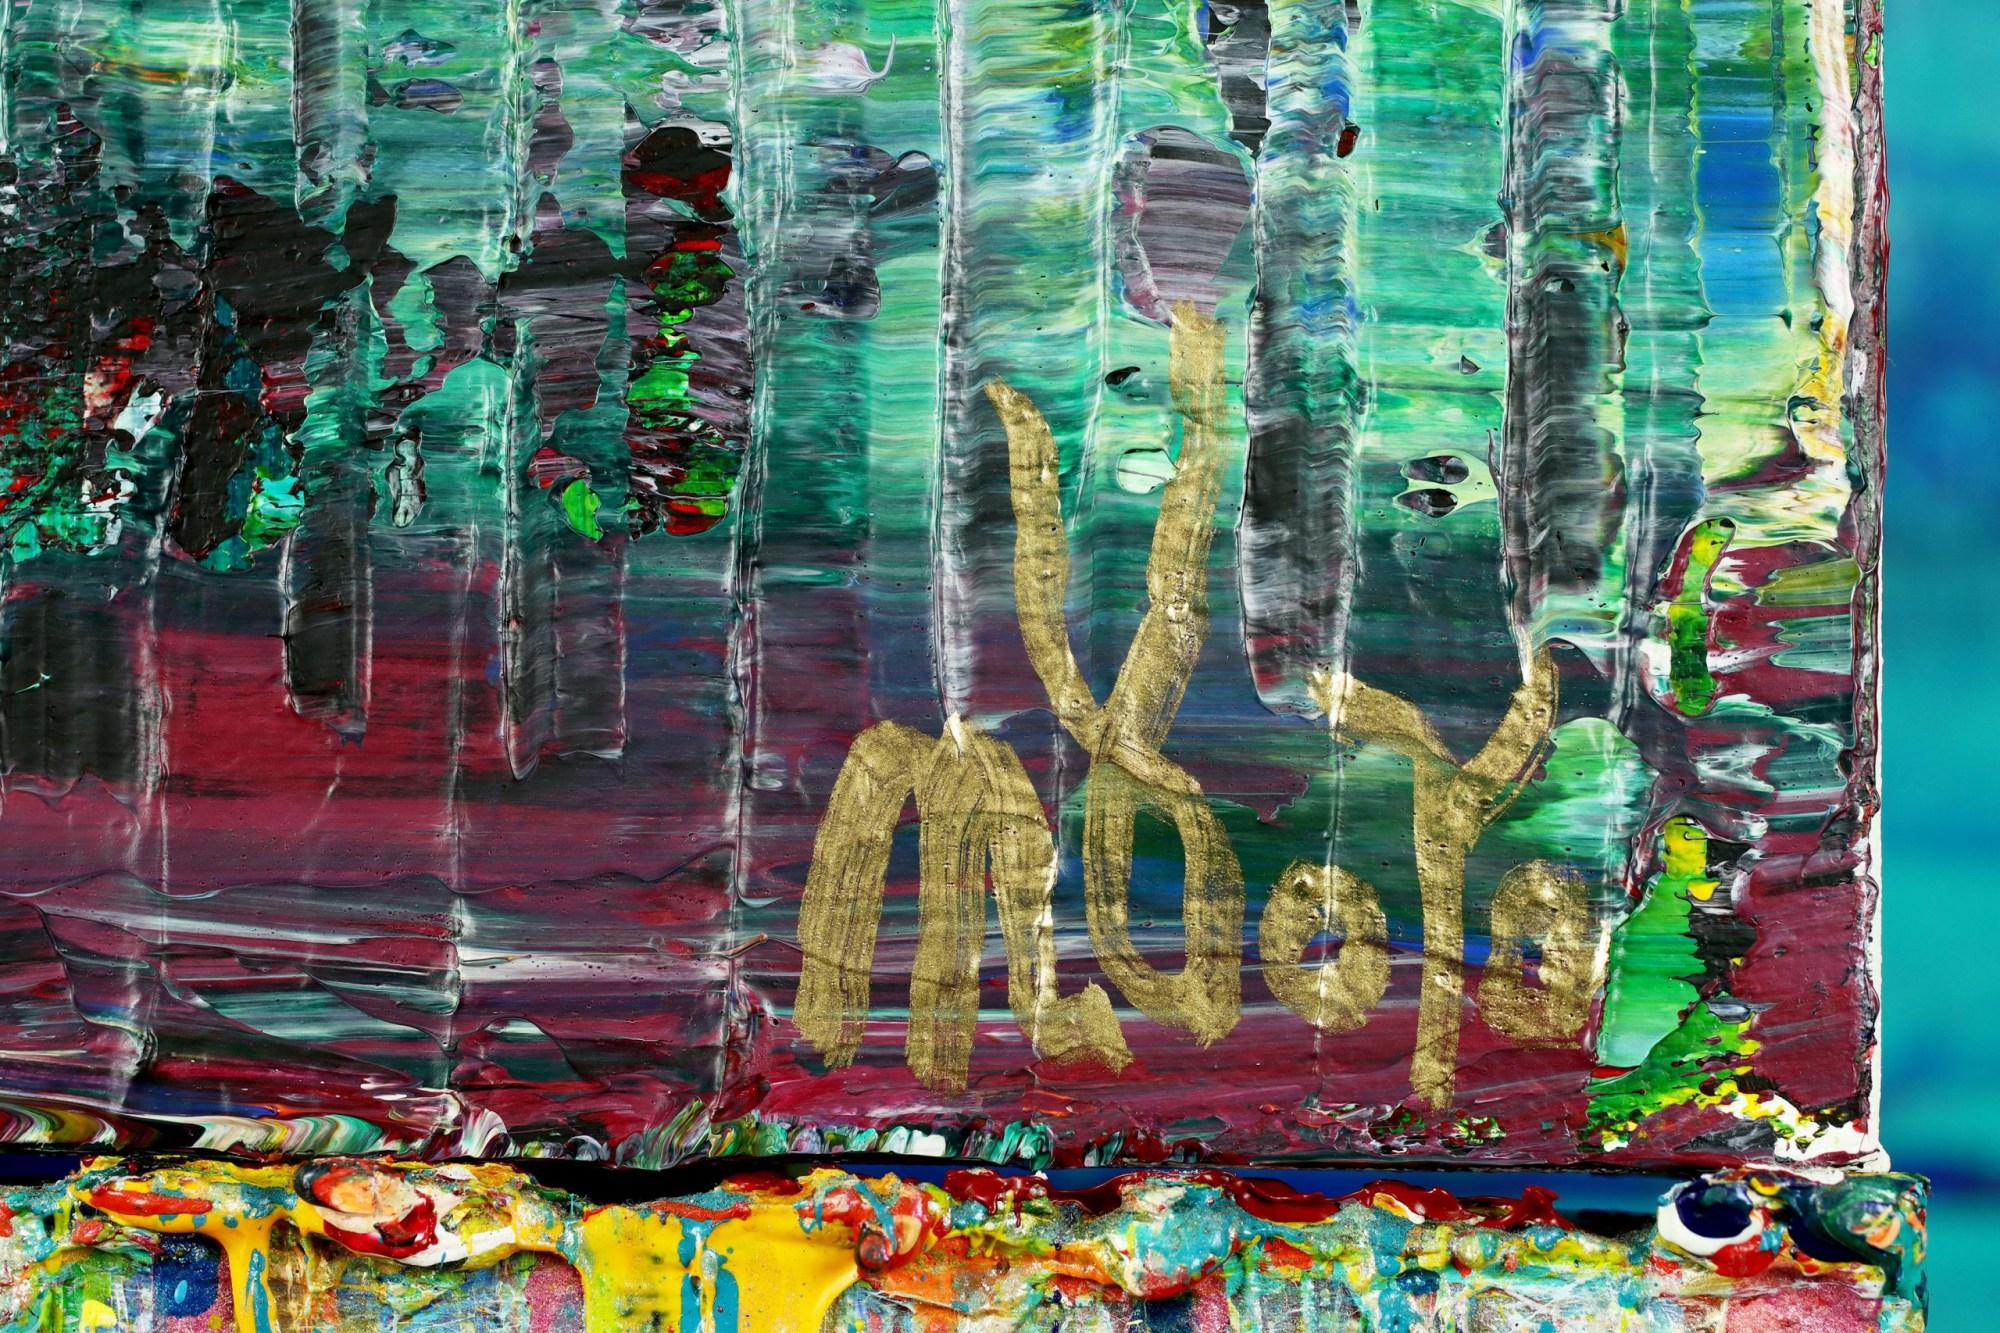 SIGNATURE / A Matter of Nature 9 (Tropics Reflections) (2021) / Artist: Nestor Toro